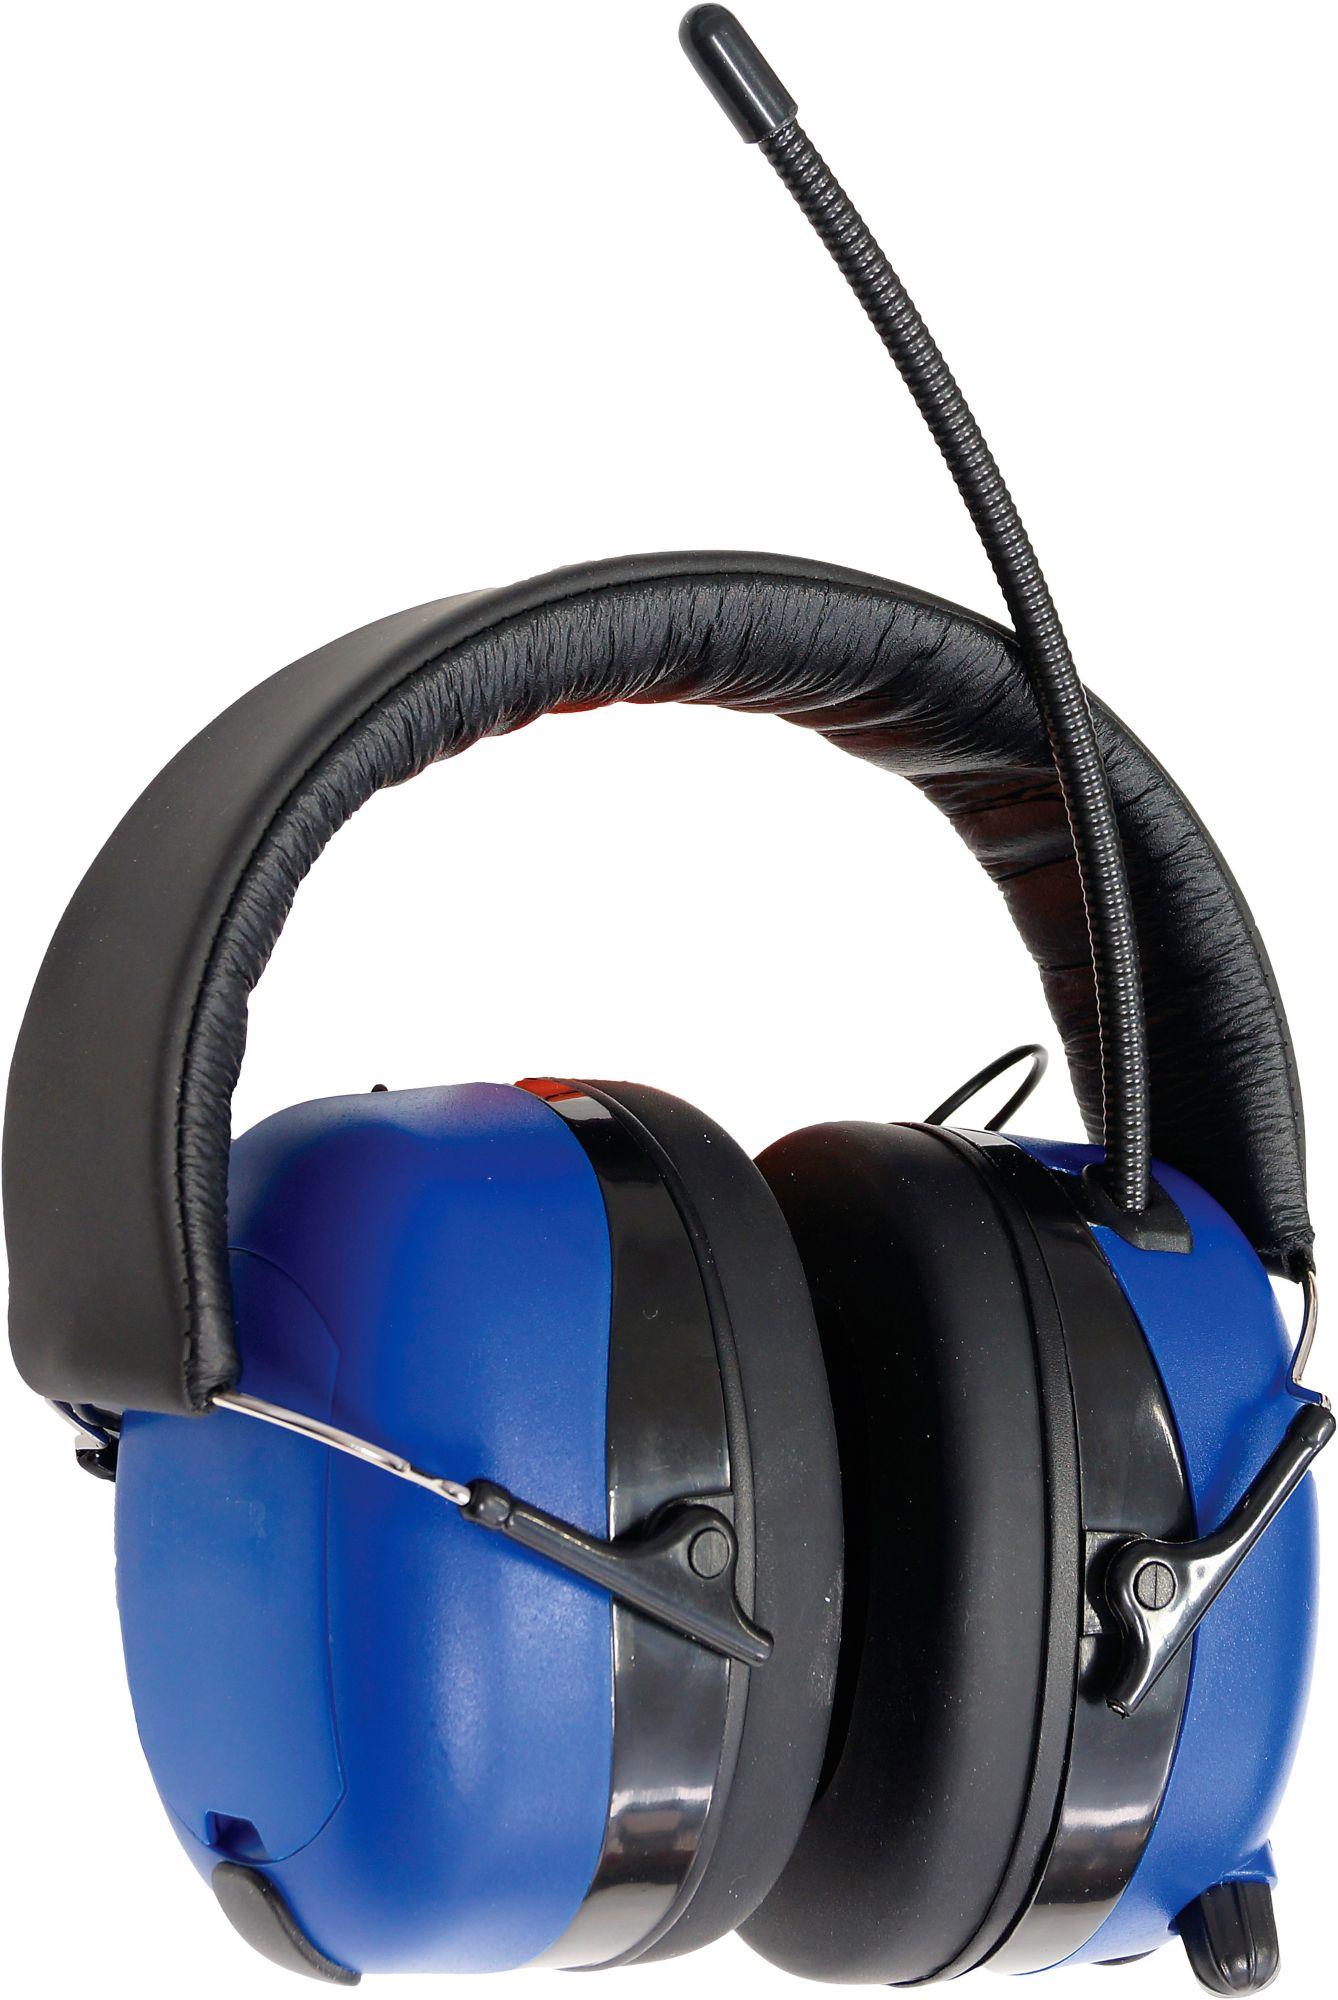 CONNEX Connex Kapselgehörschutz »COXT938703«, mit Radio